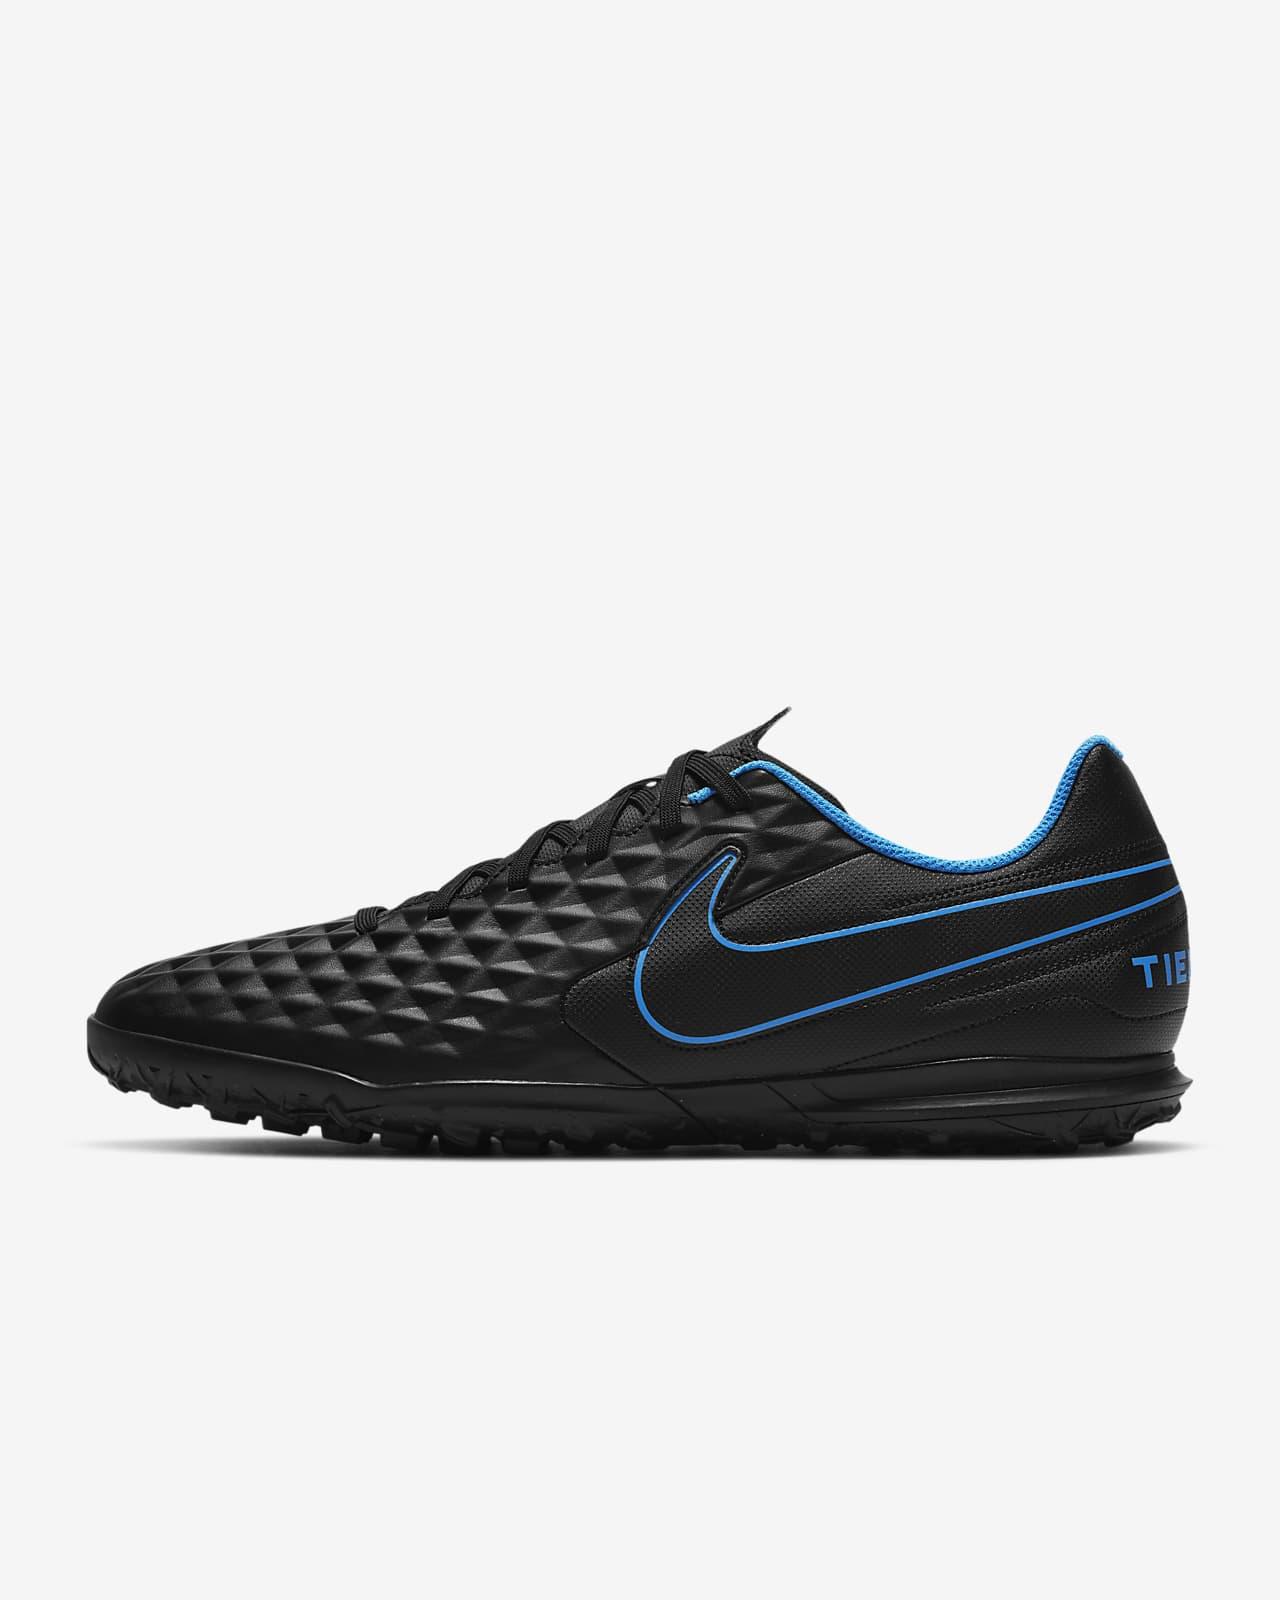 Nike Tiempo Legend 8 Club TF Artificial-Turf Soccer Shoes